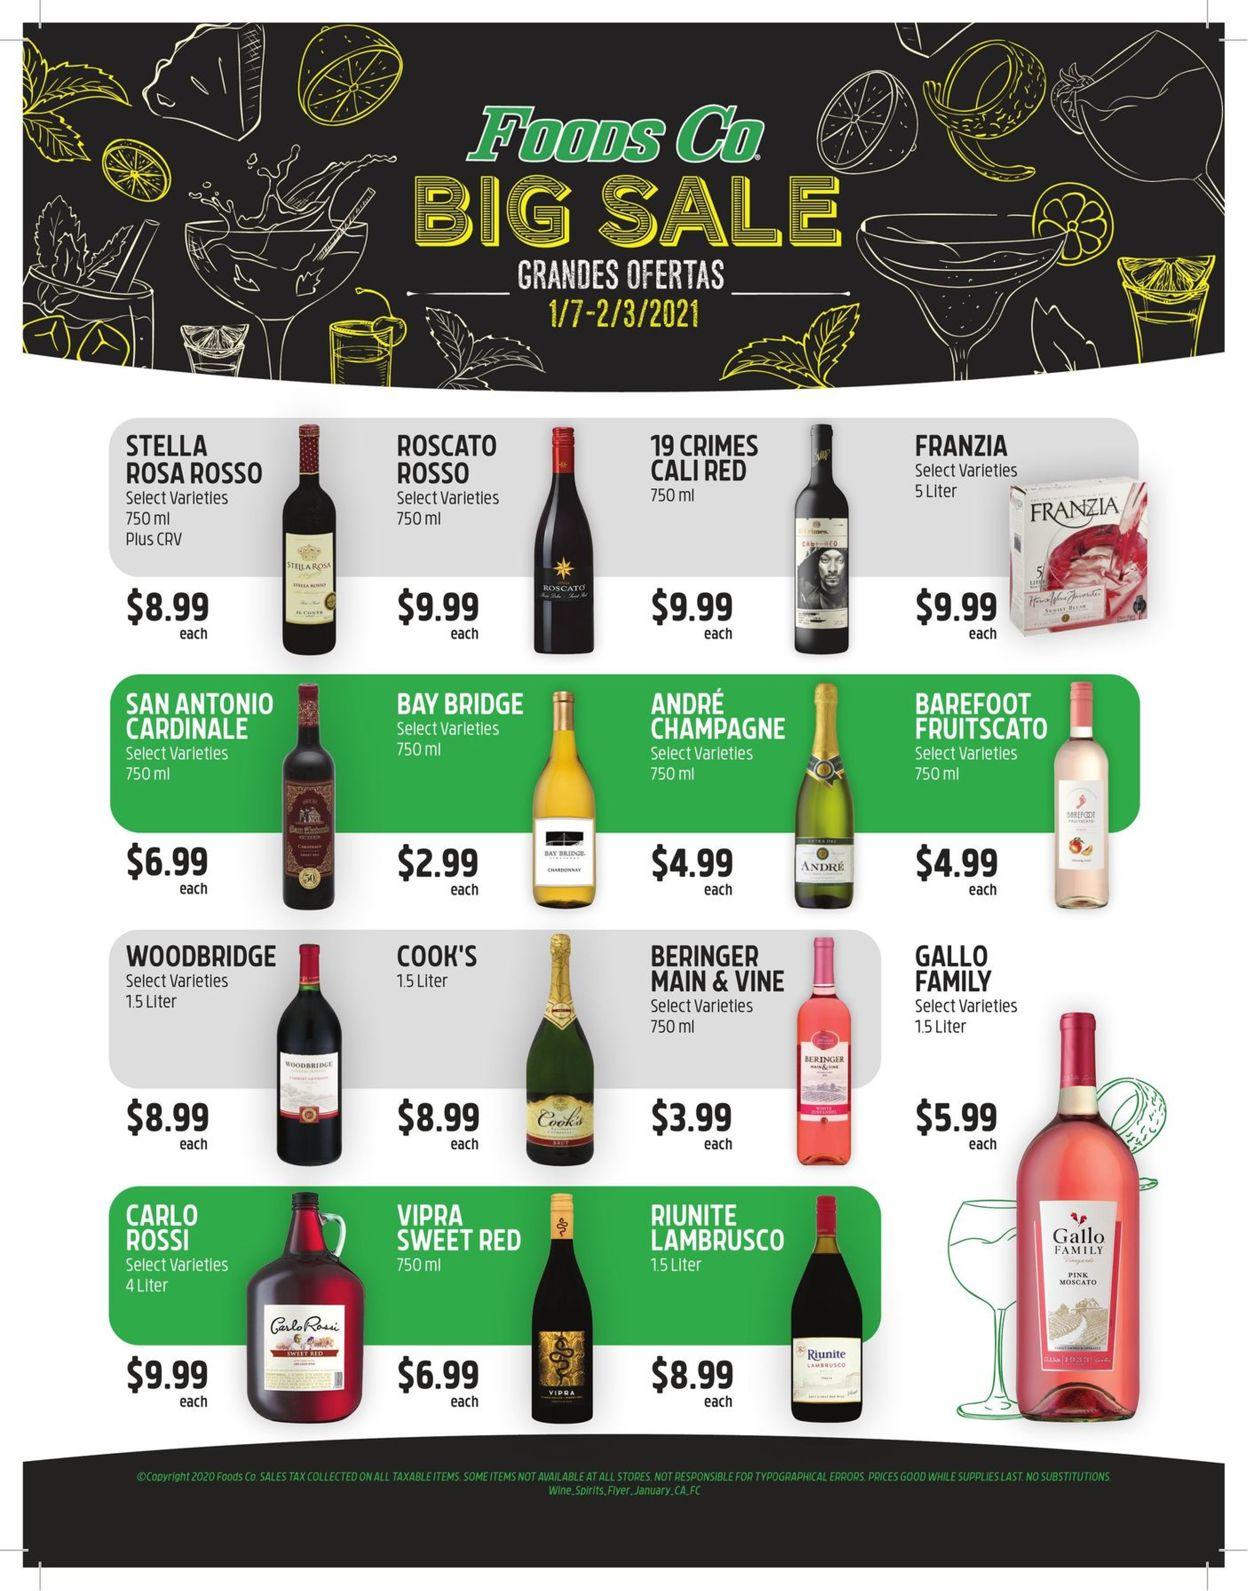 Foods Co. Wine & Spirits Ad 2021 Weekly Ad Circular - valid 01/07-02/03/2021